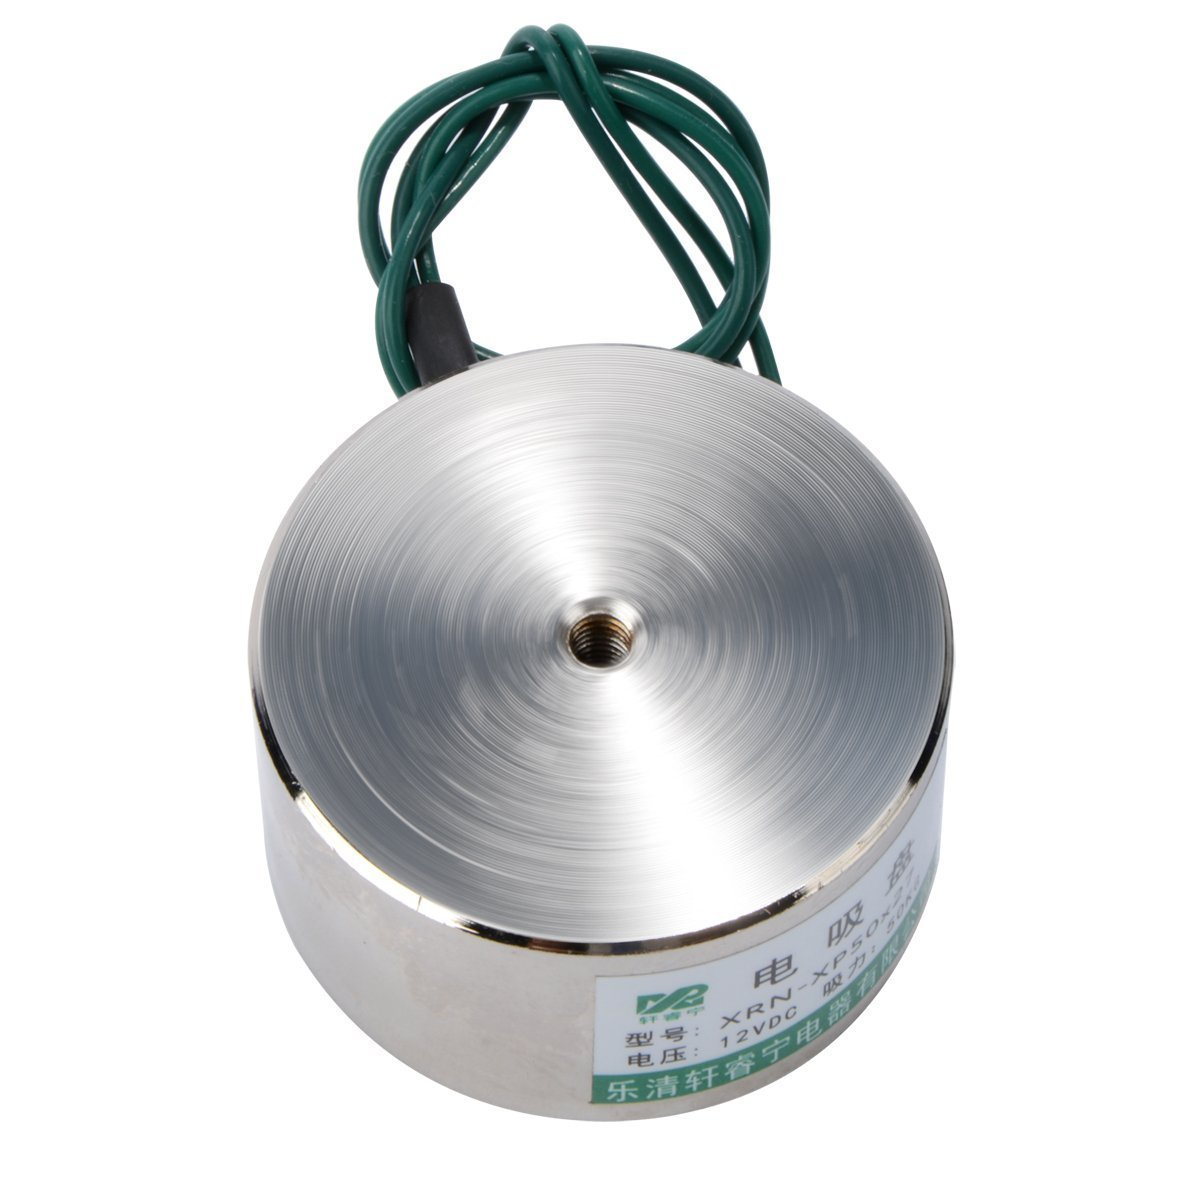 YXQ 50Kg/110LB Electromagnet Solenoid Electric Lifting Magnet Lift Holding, DC 12V 50mm Dia.